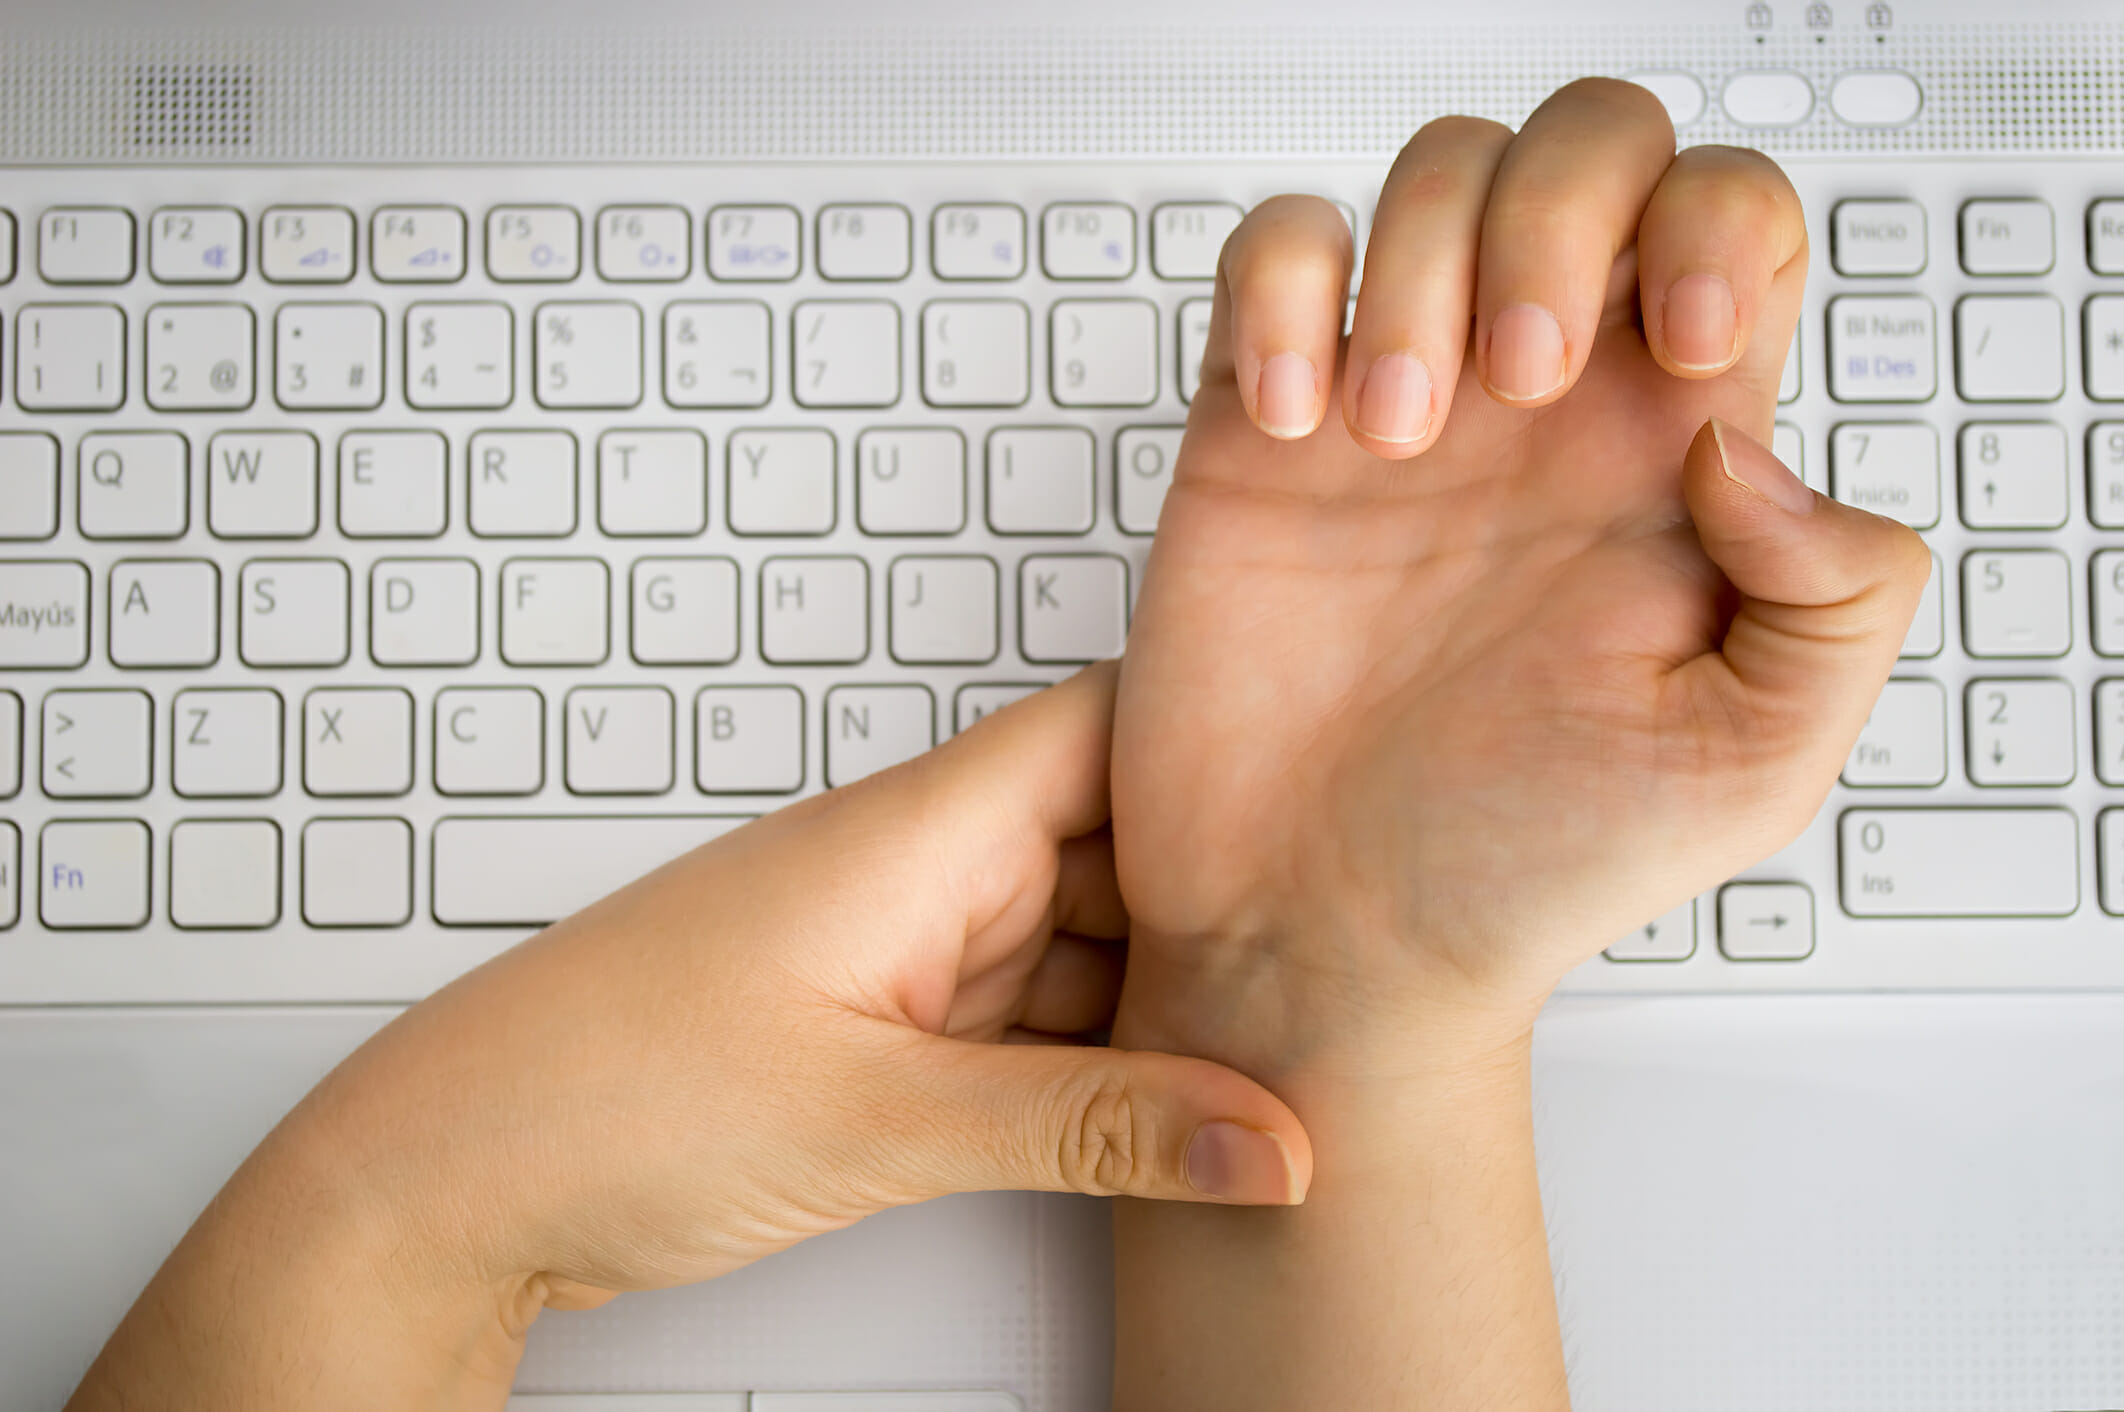 Wrists at Work